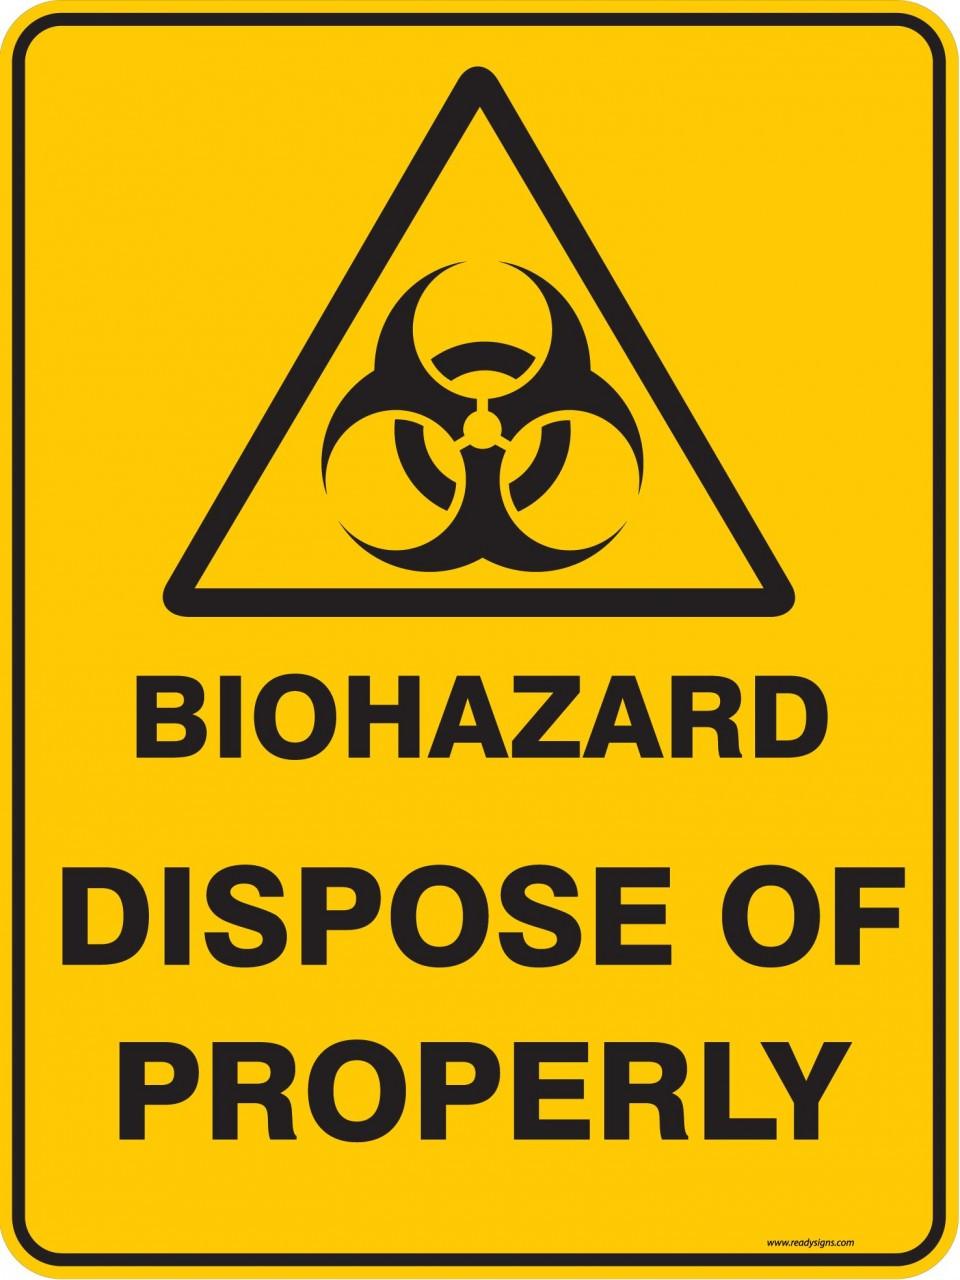 image relating to Biohazard Sign Printable identified as Biohazard Signal Printable -